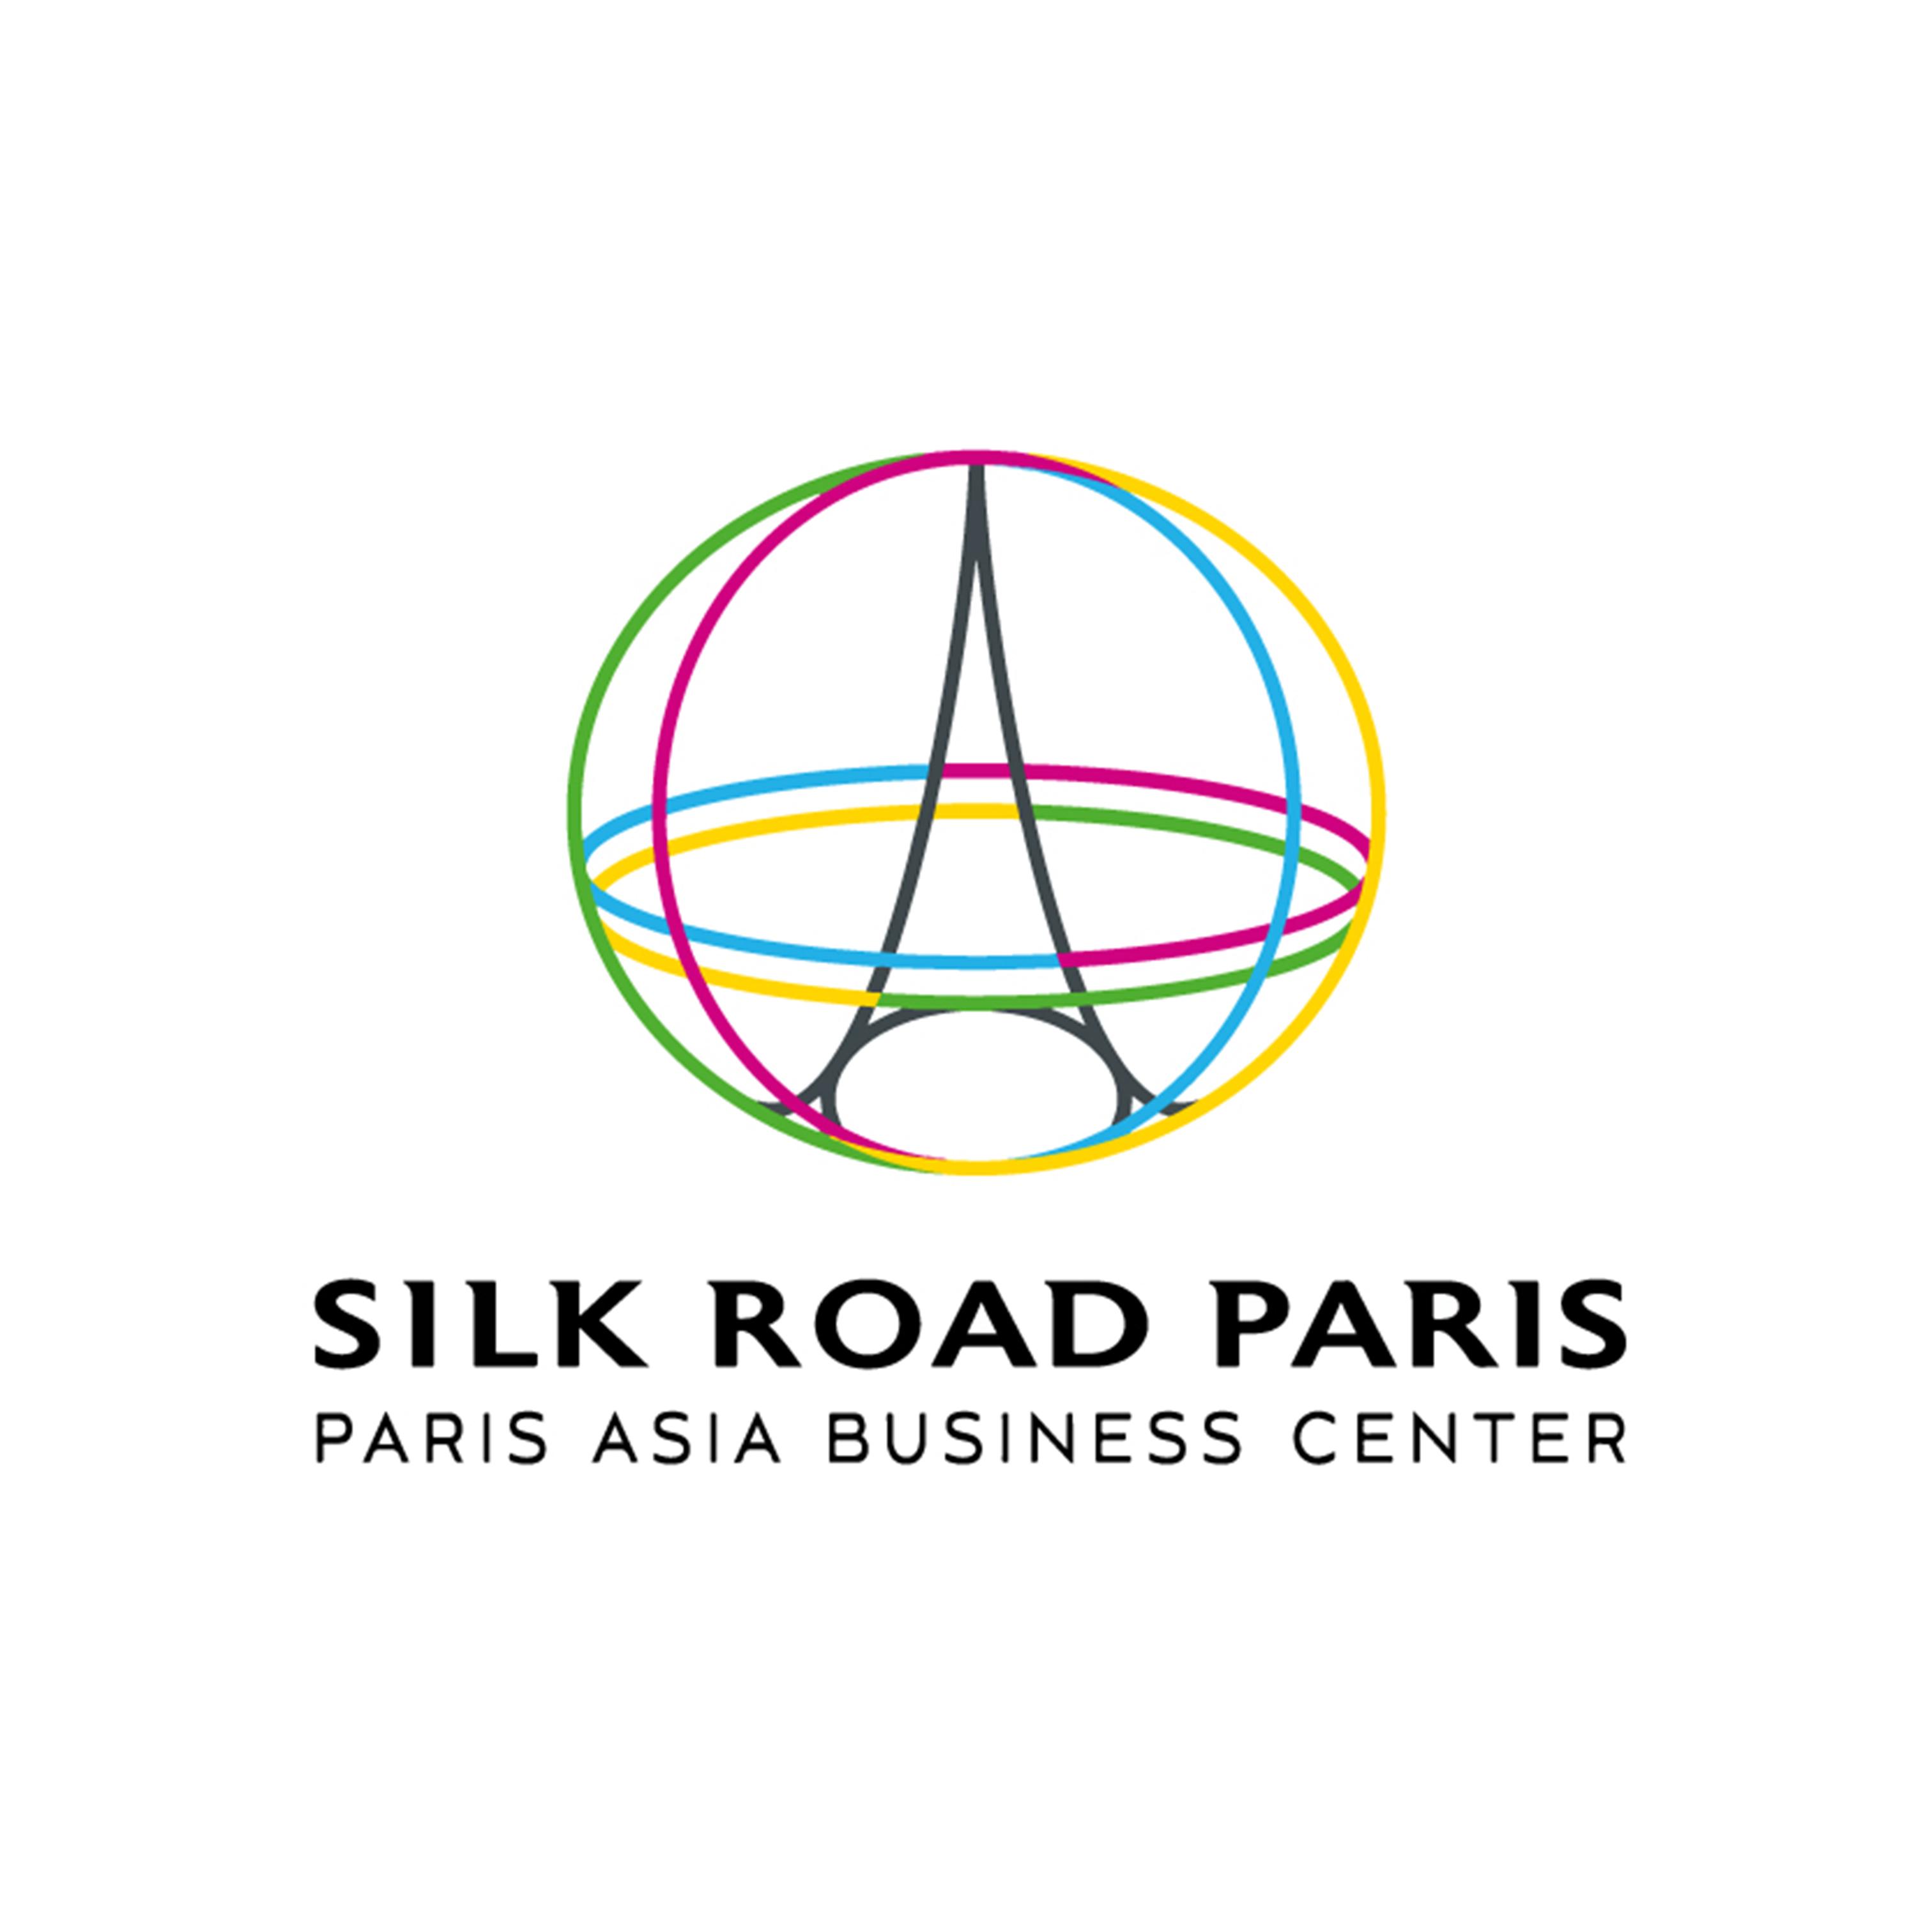 silkroad-paris-logo